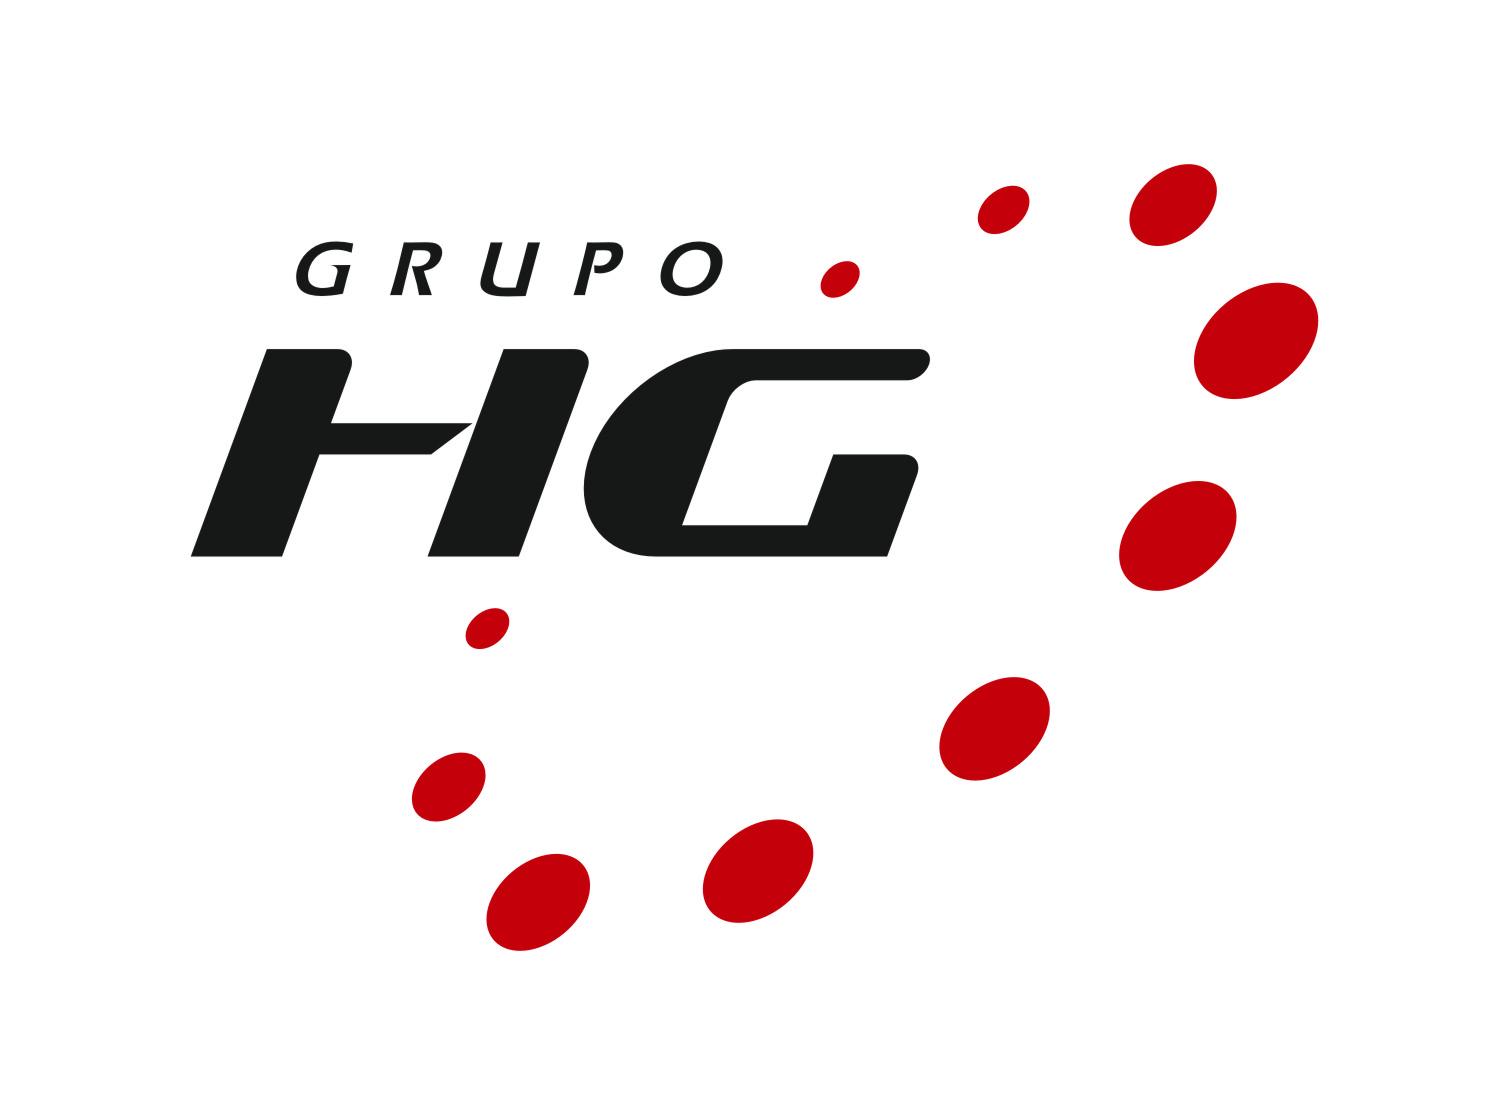 Grupo HG Tienda en Linea